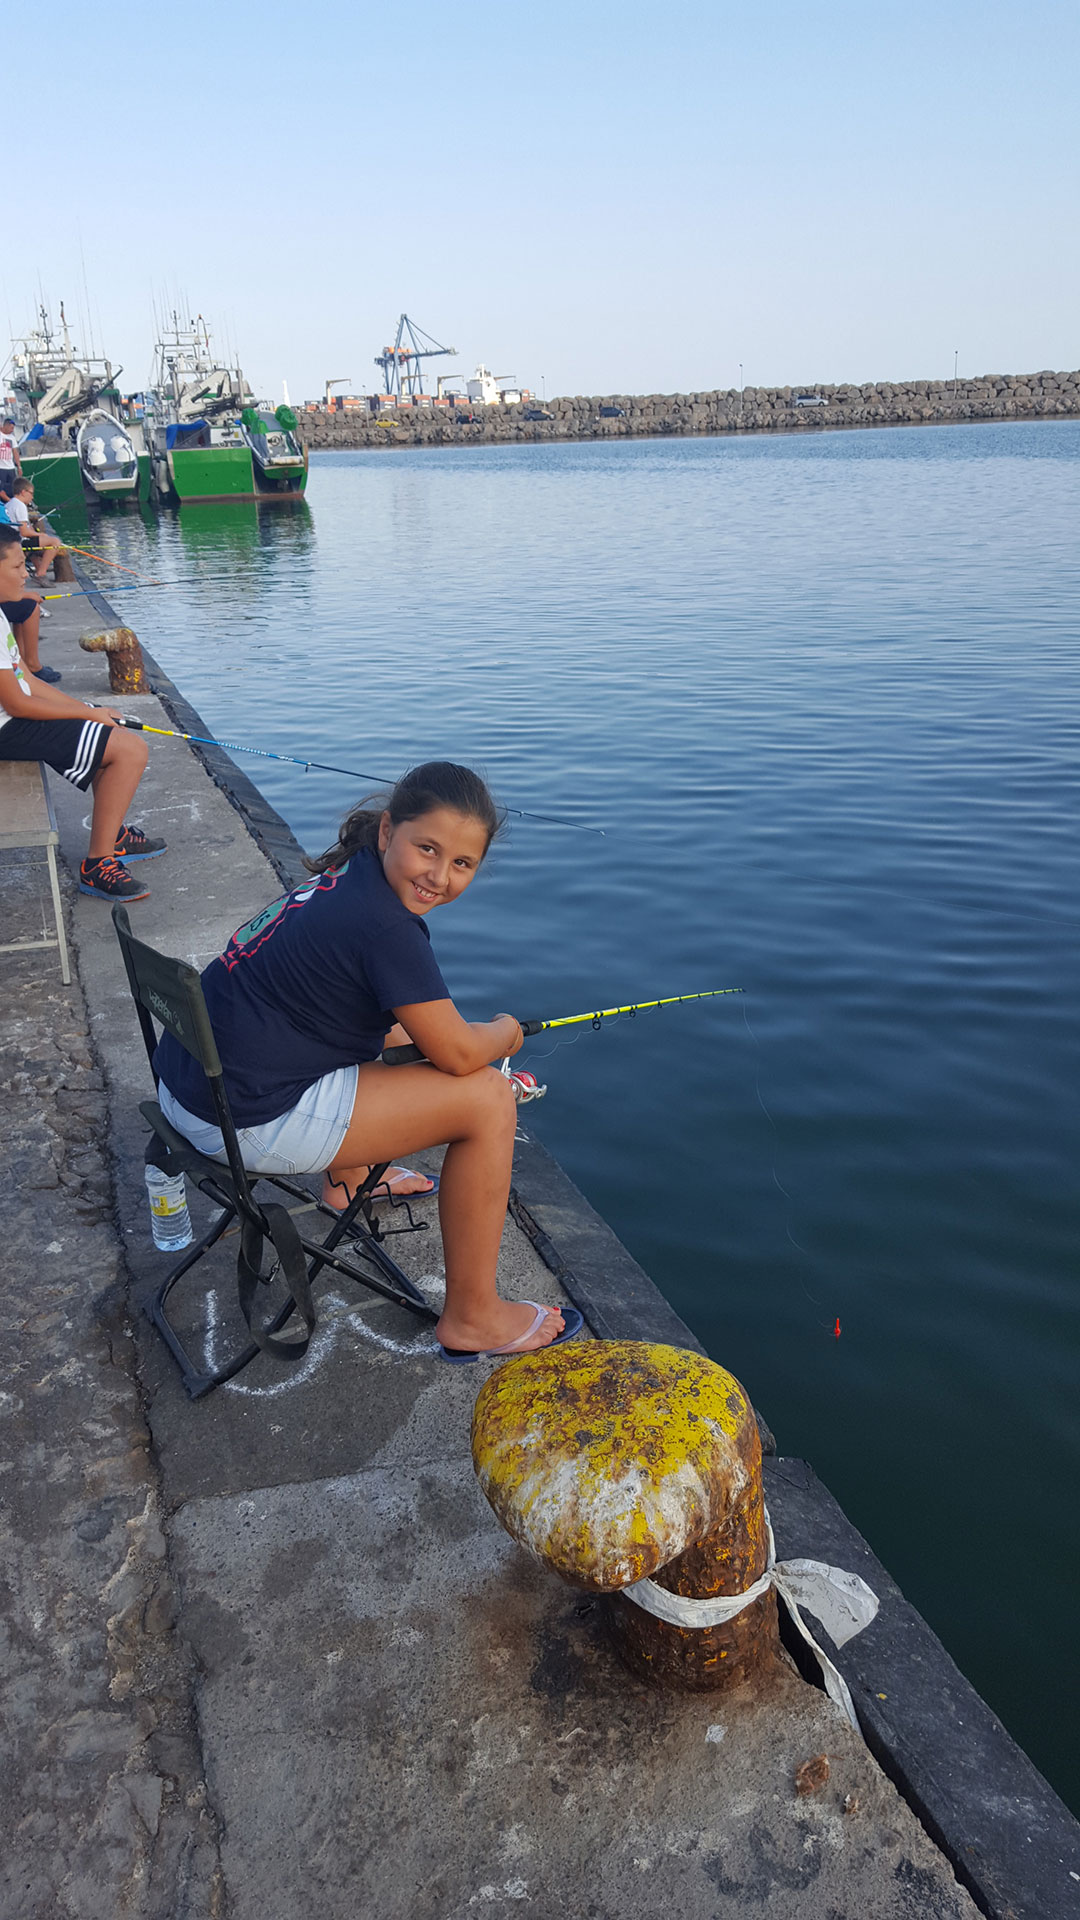 160811-curso-pesca-191654